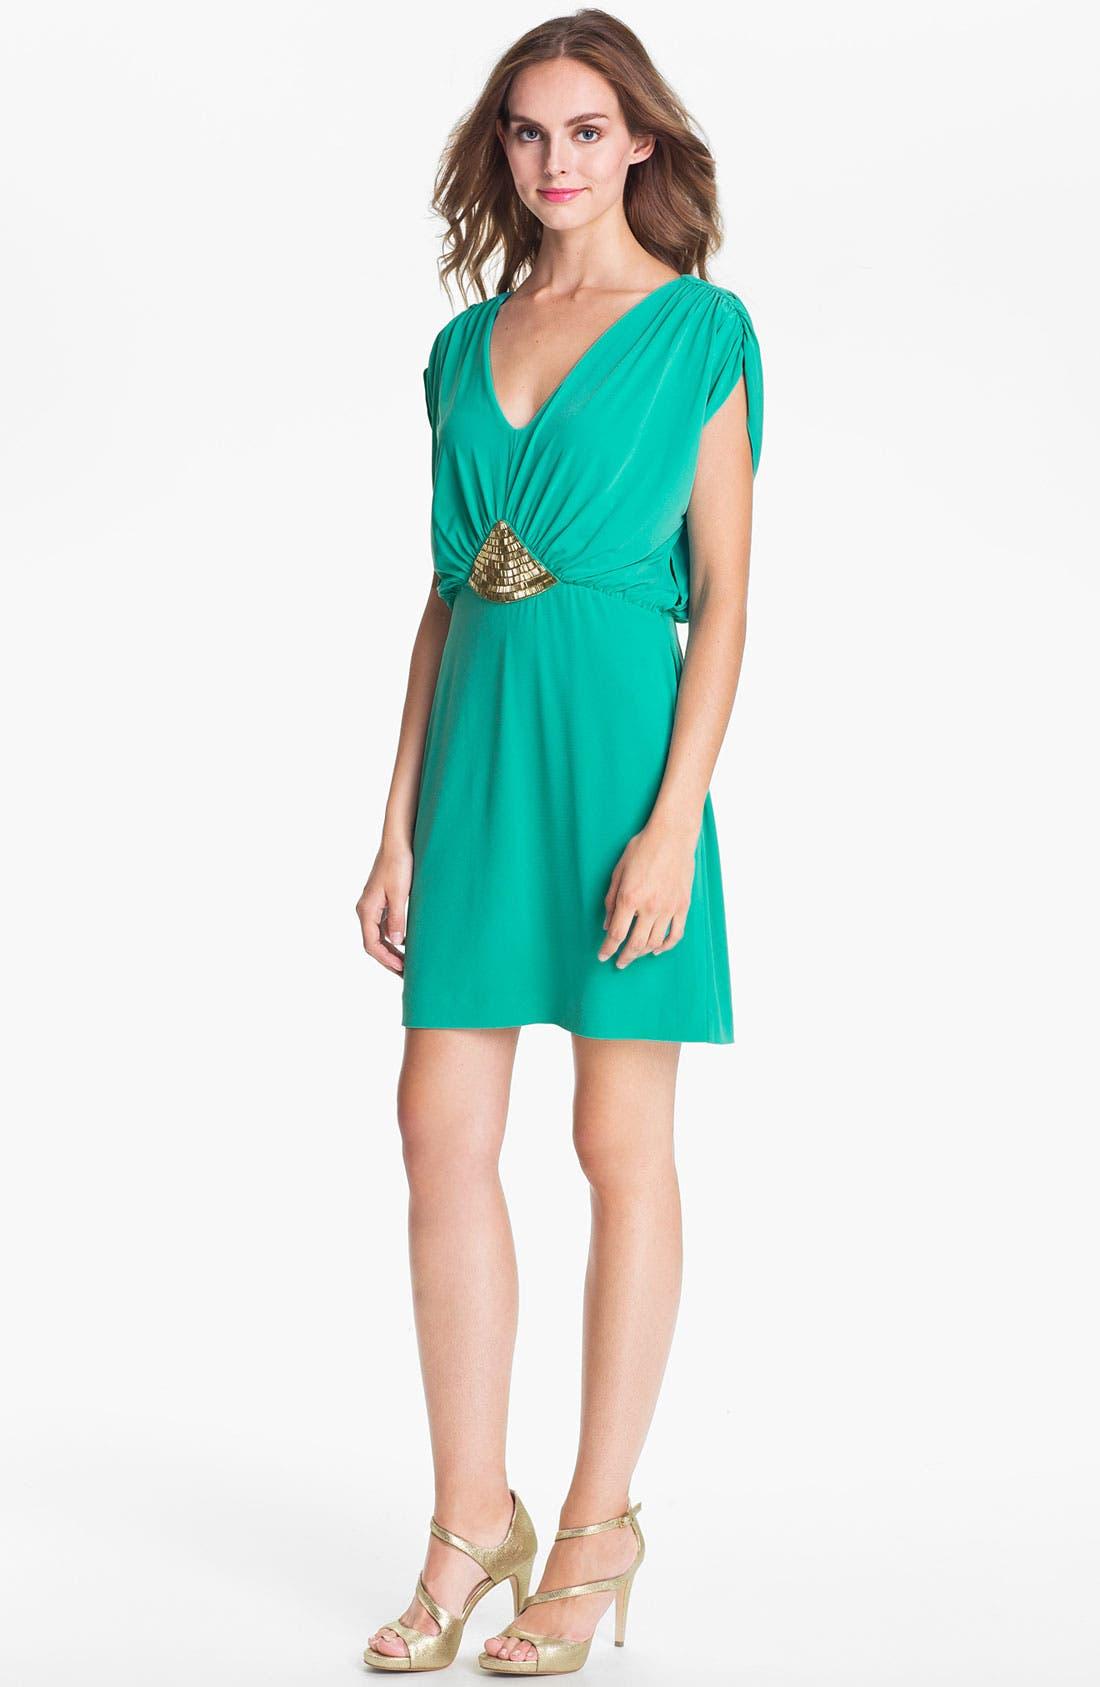 Alternate Image 1 Selected - Trina Turk Embellished Blouson Jersey Dress